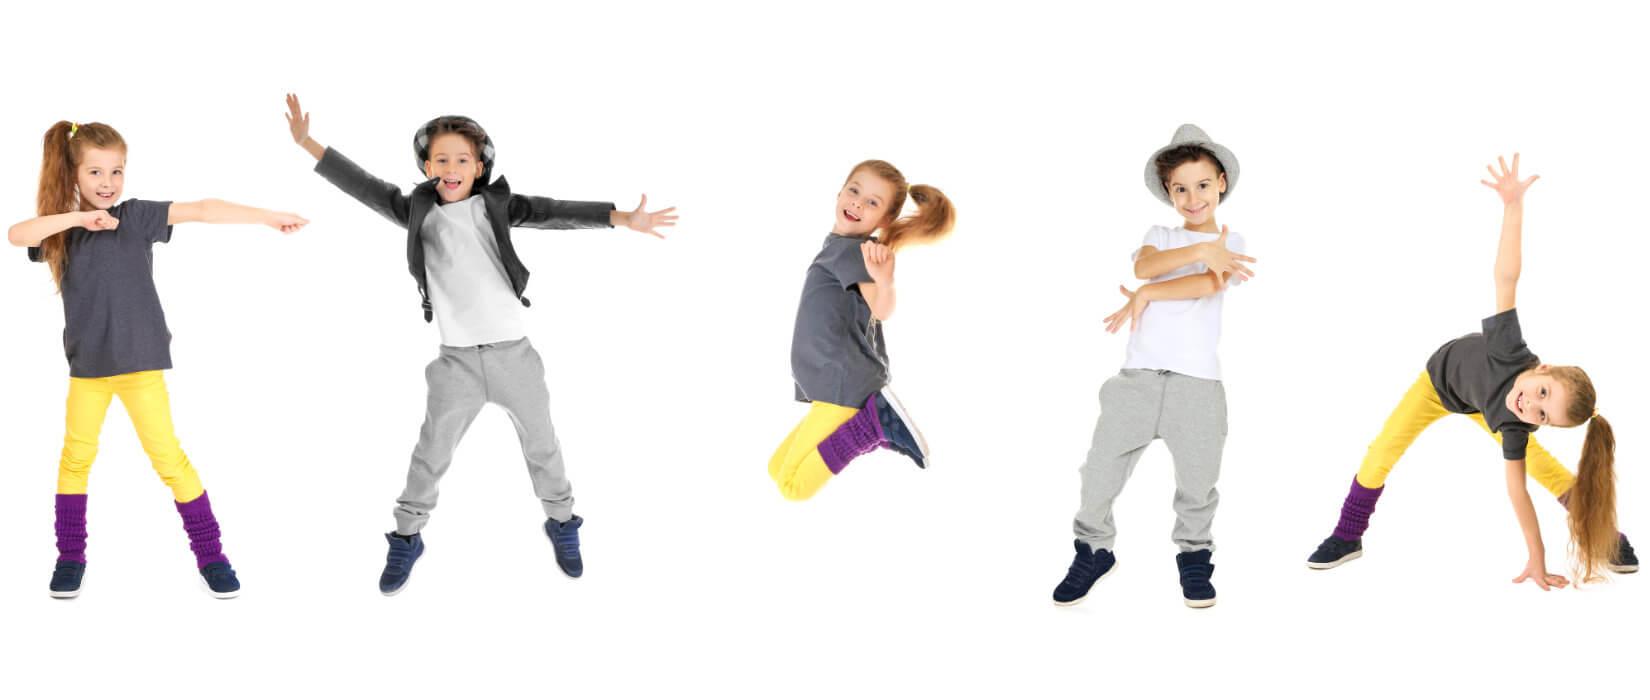 Safeguarding training certification suitable for dance teachers